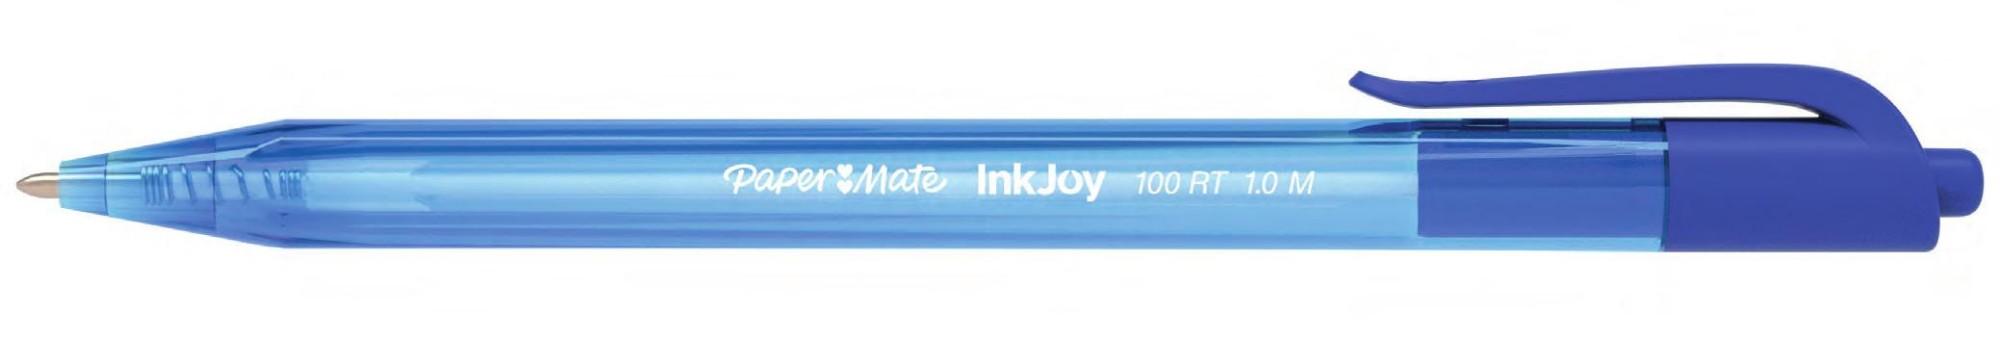 Papermate InkJoy 100 RT Clip-on retractable ballpoint pen Medium Blue 20pc(s)